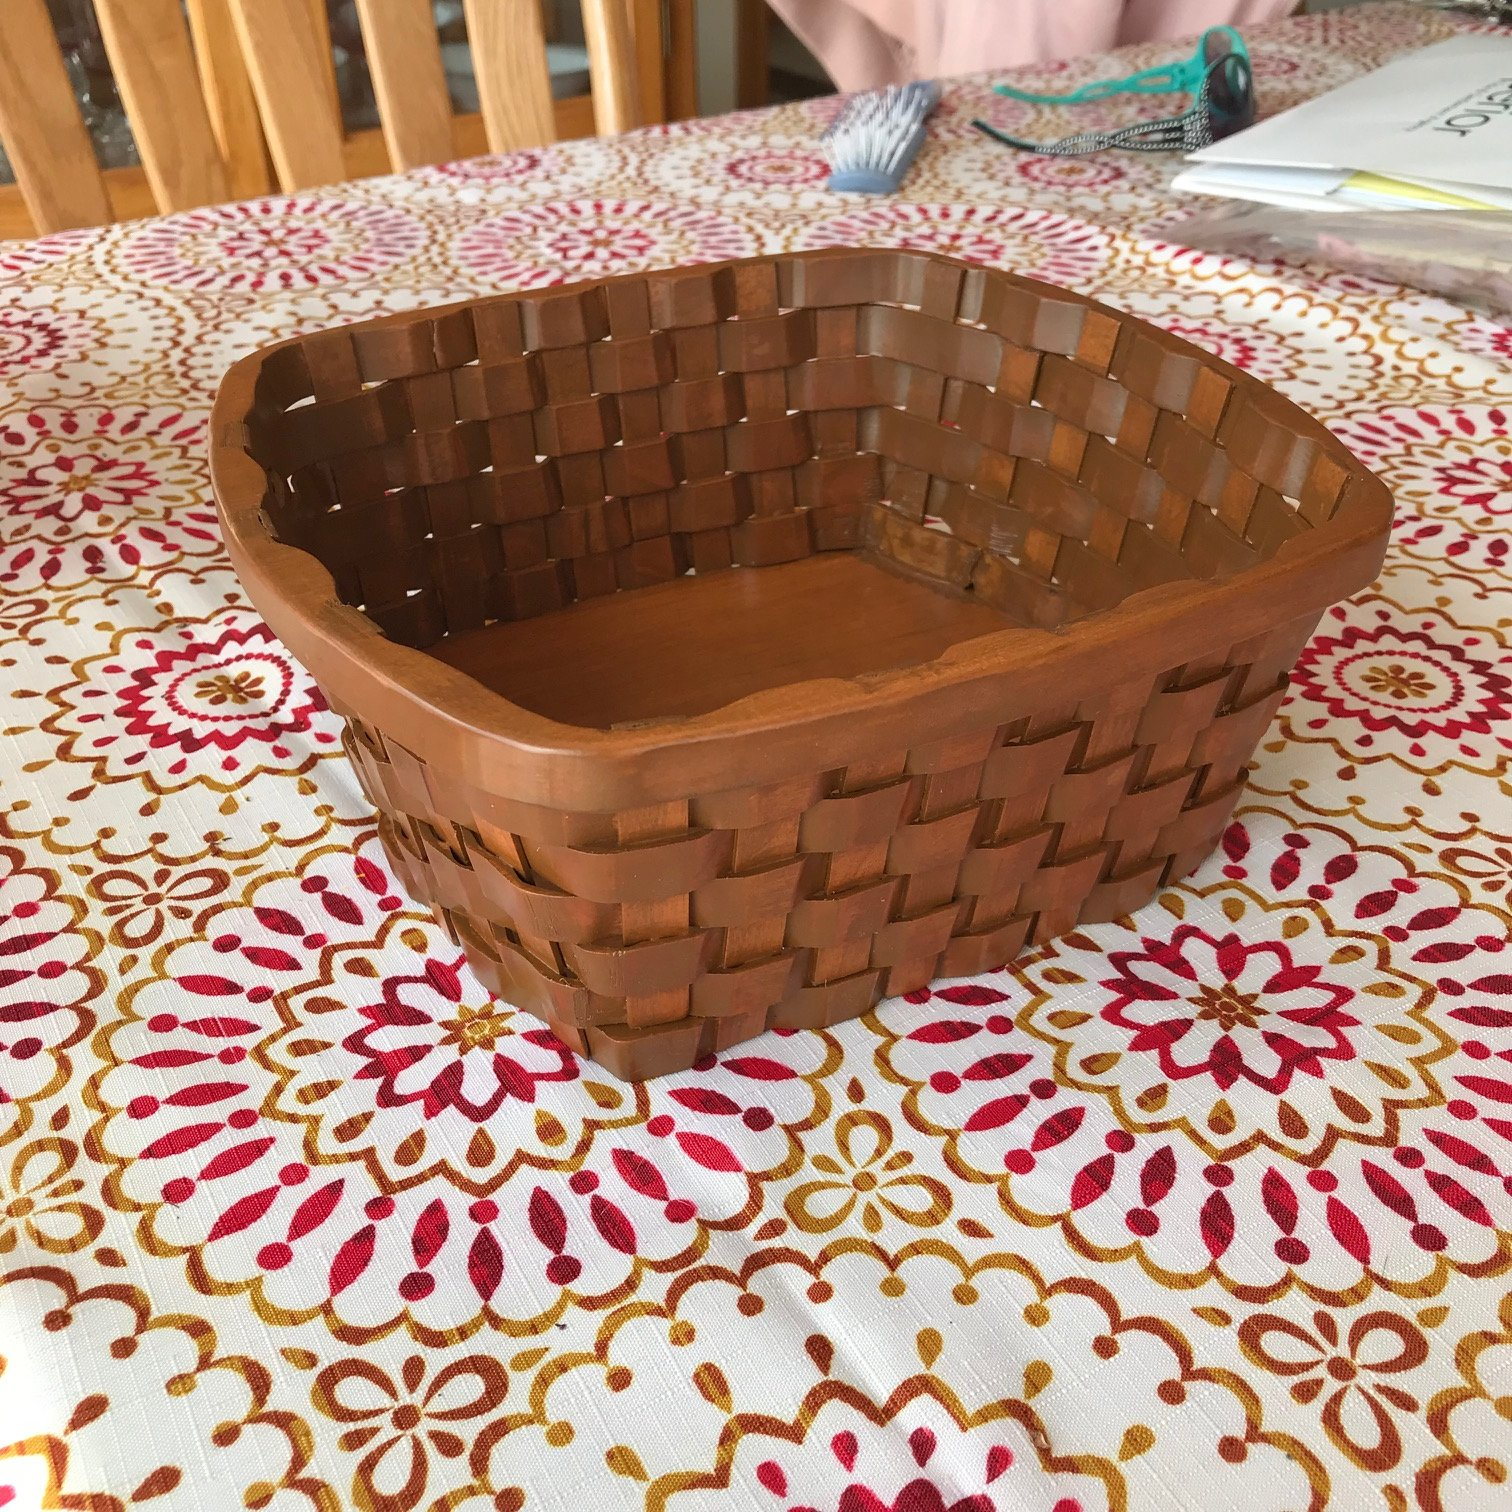 Monroe Dutcher Basket - General Scroll Sawing - Scroll Saw Village